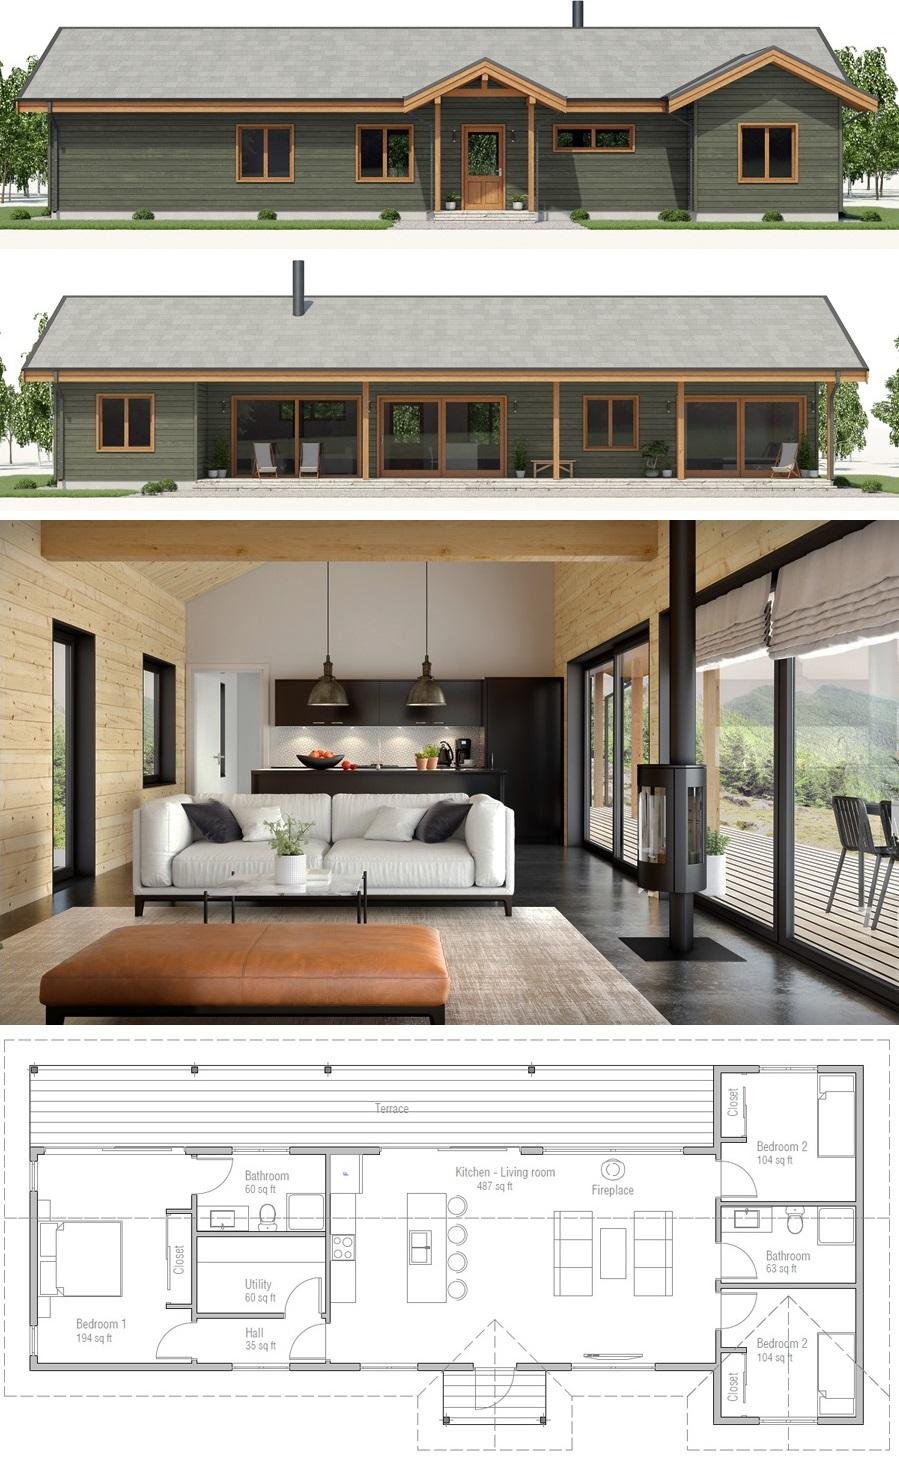 Home Plan Ch520 House Blueprints House Plans Building A House